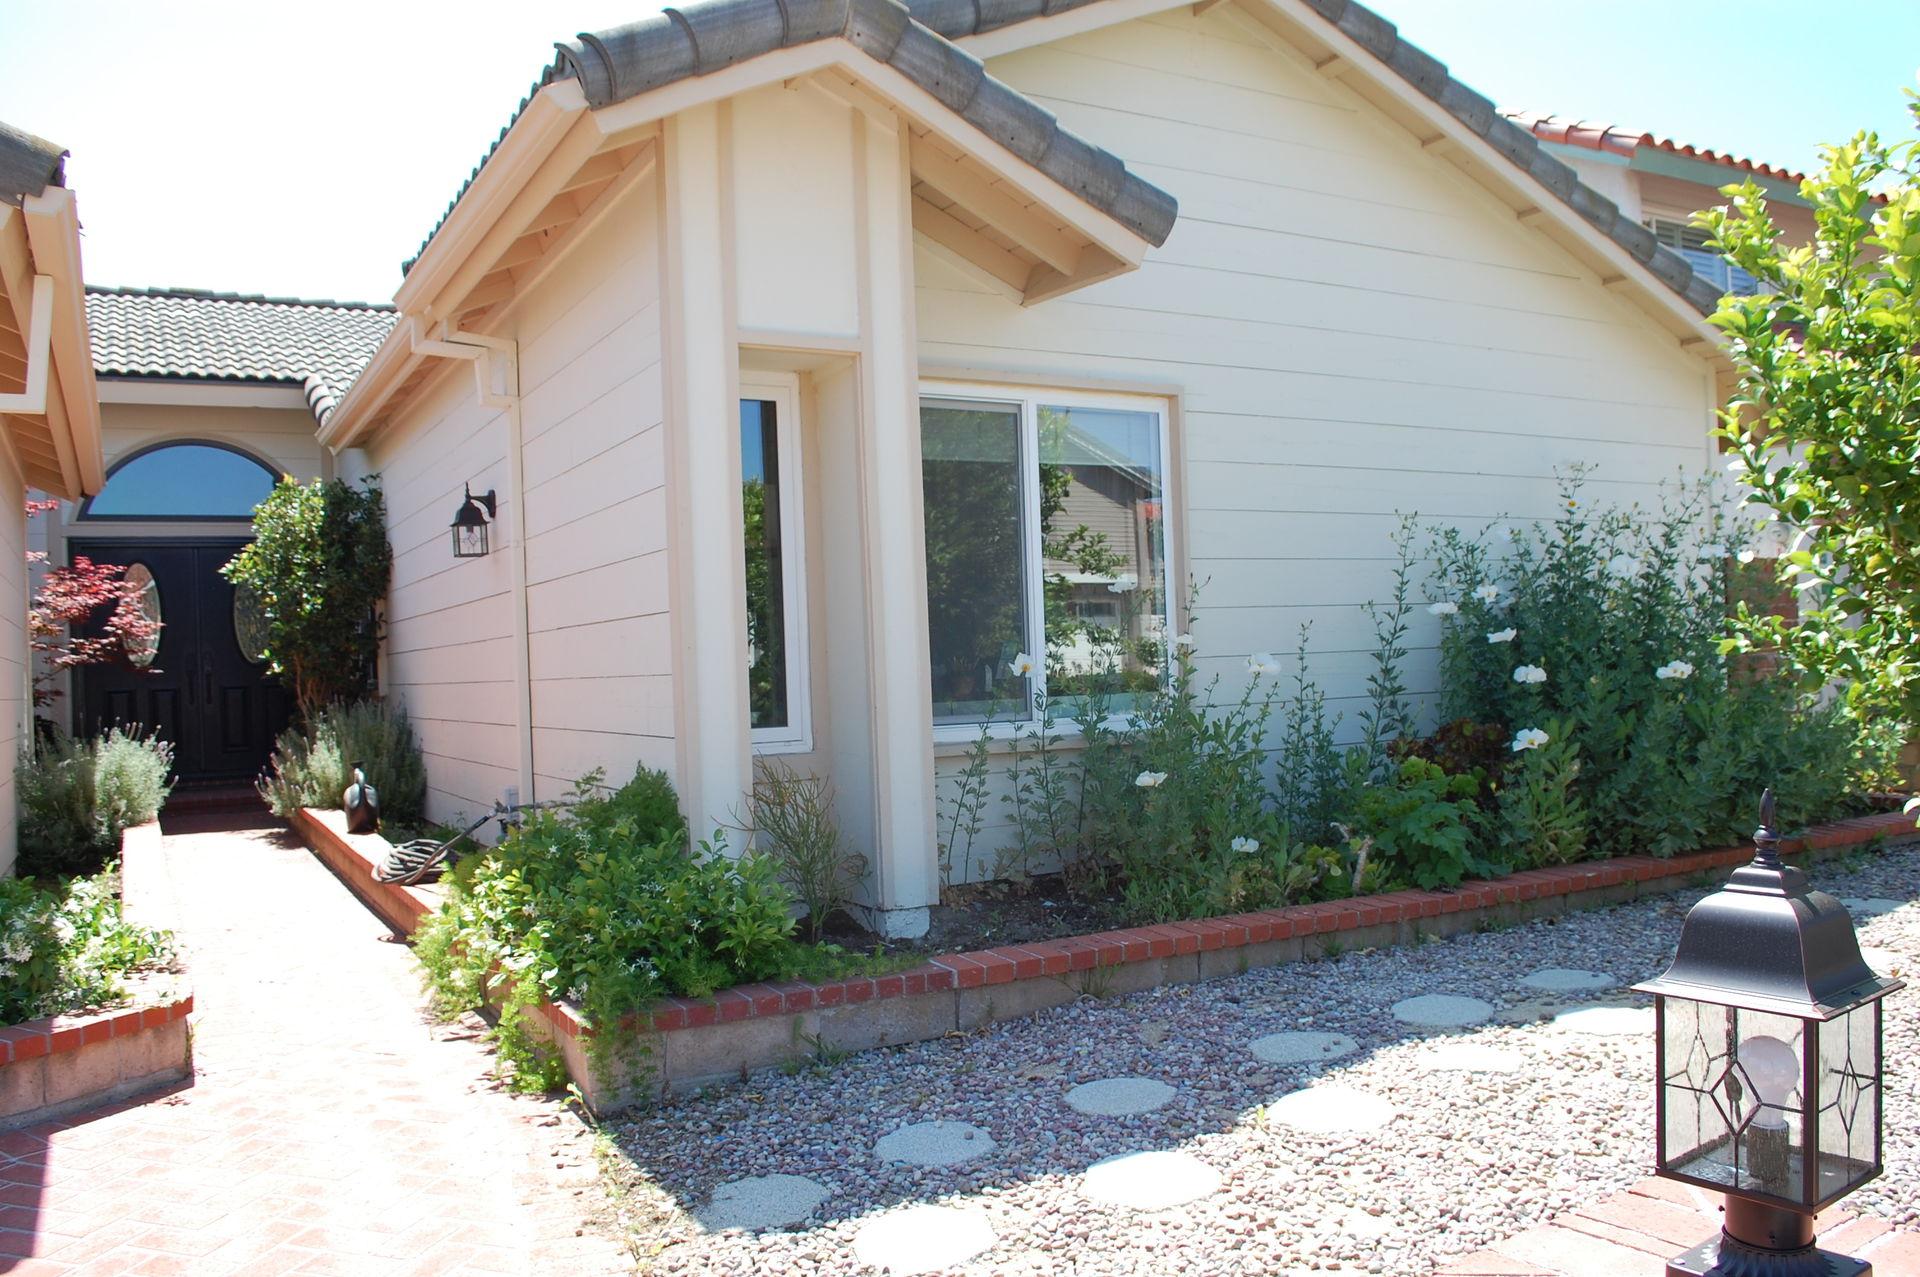 Family Home in Comfortable Orange County Neighborhood - Boligbytte